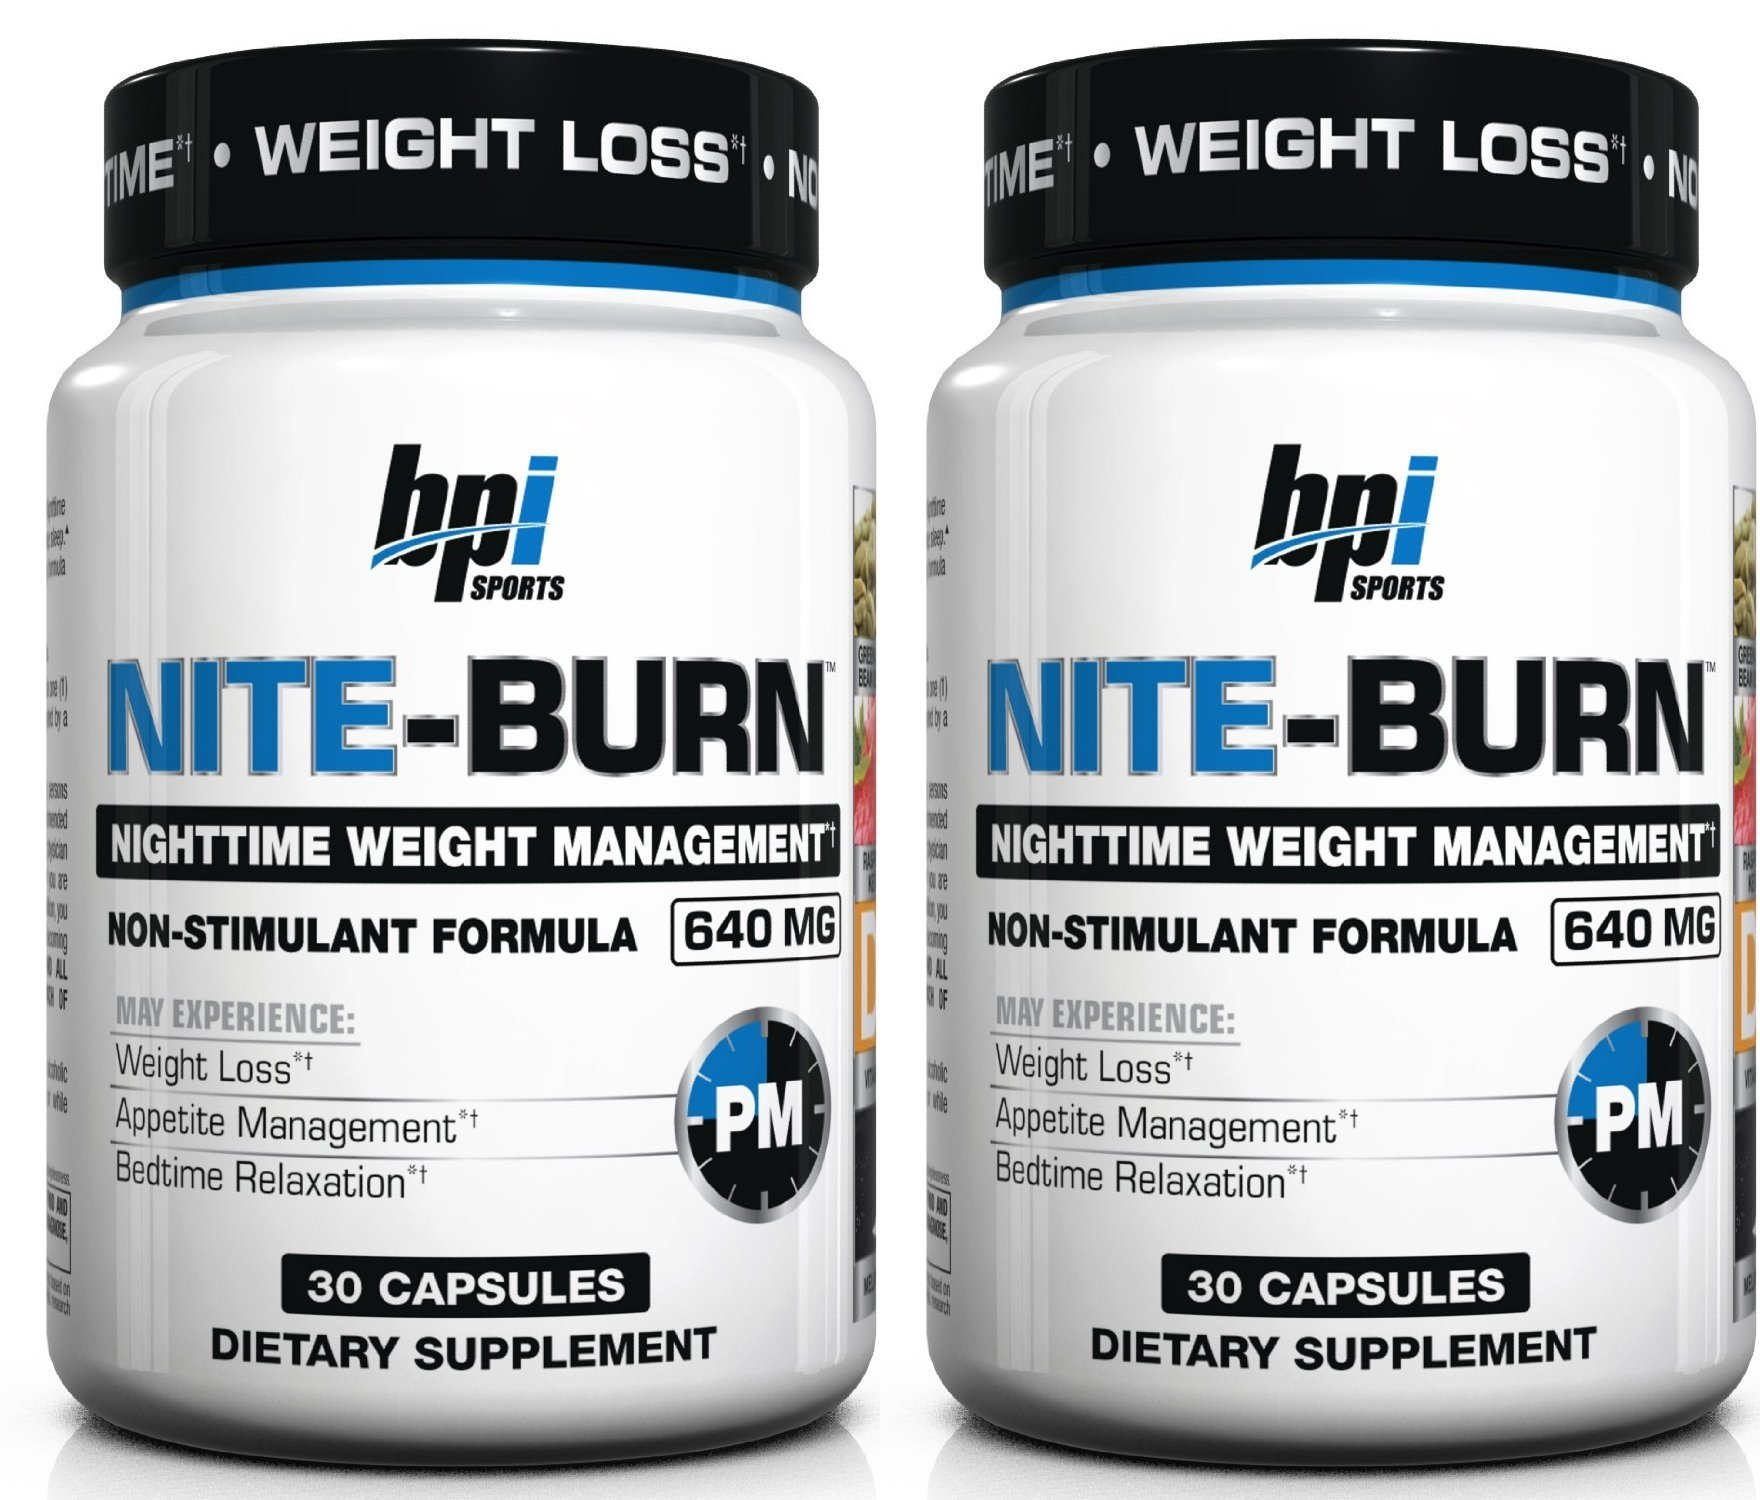 BPI Sports Nite Burn Nighttime Weight Management Formula, 30-count (30 X 2)